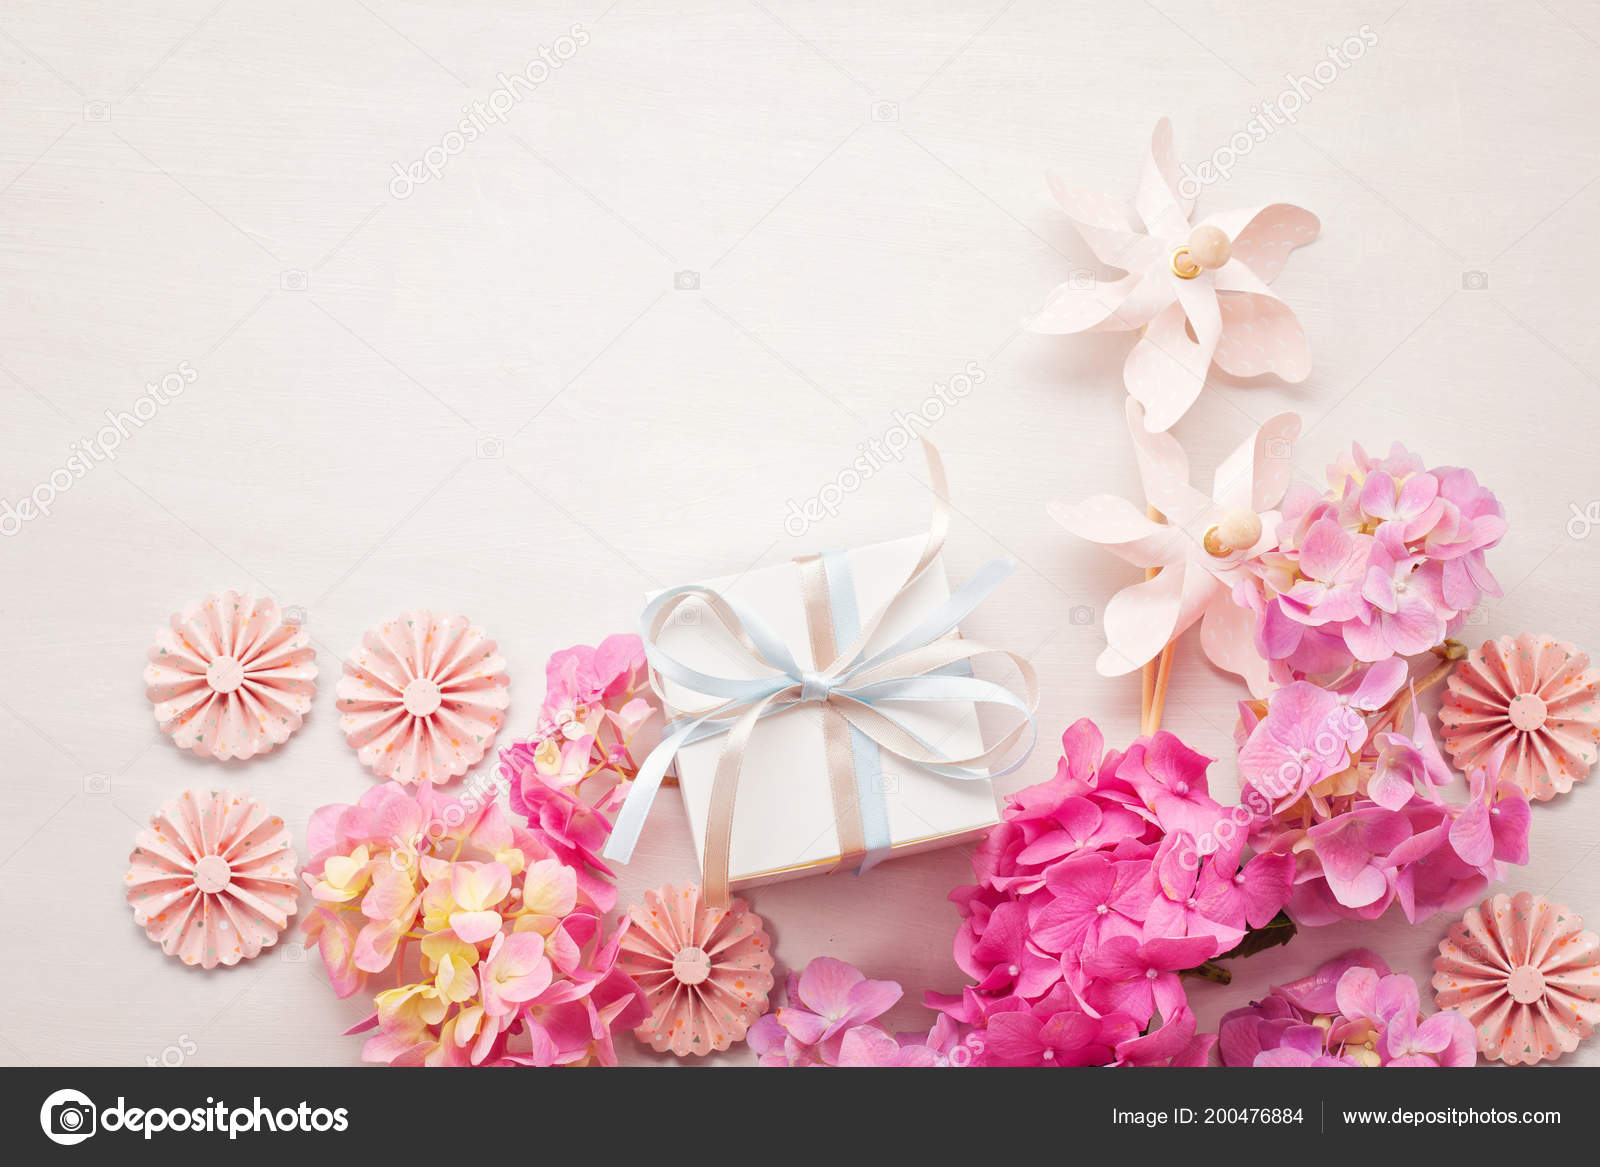 Hortensia Flowers Concept Celebration Greetings Holidays Stock